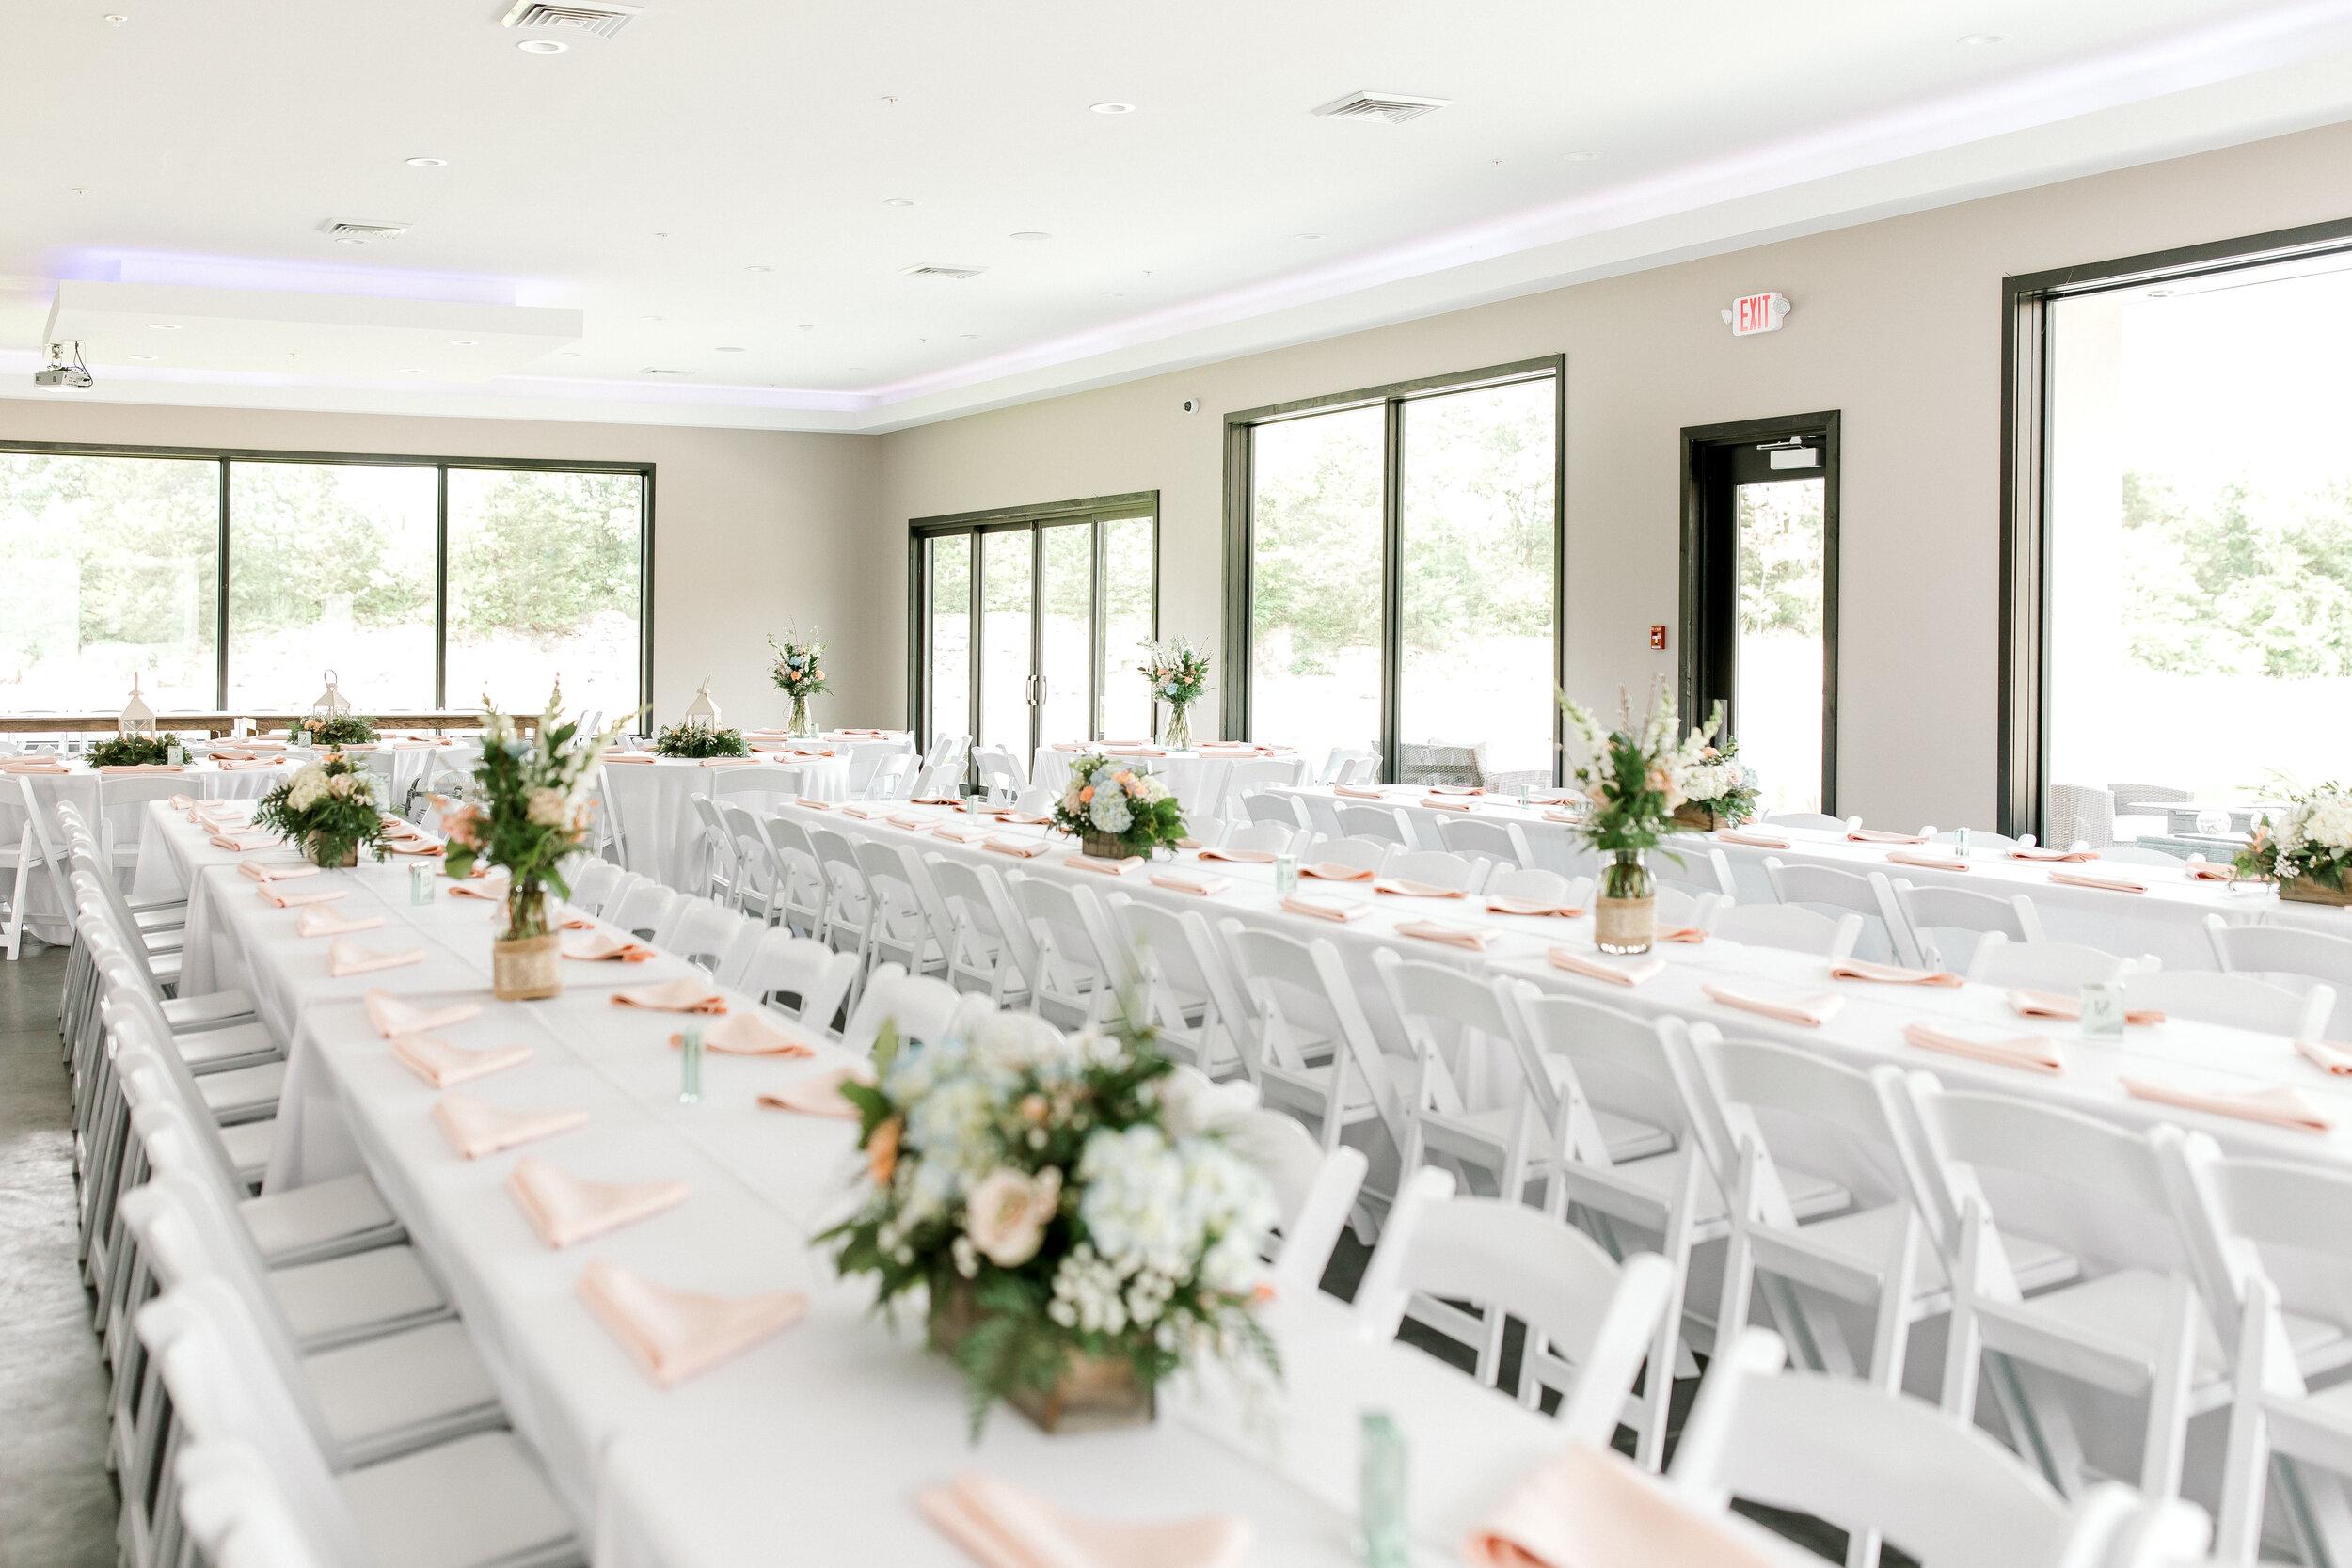 060119_Wedding_Brittany_Eddie_SS (160 of 354).jpg